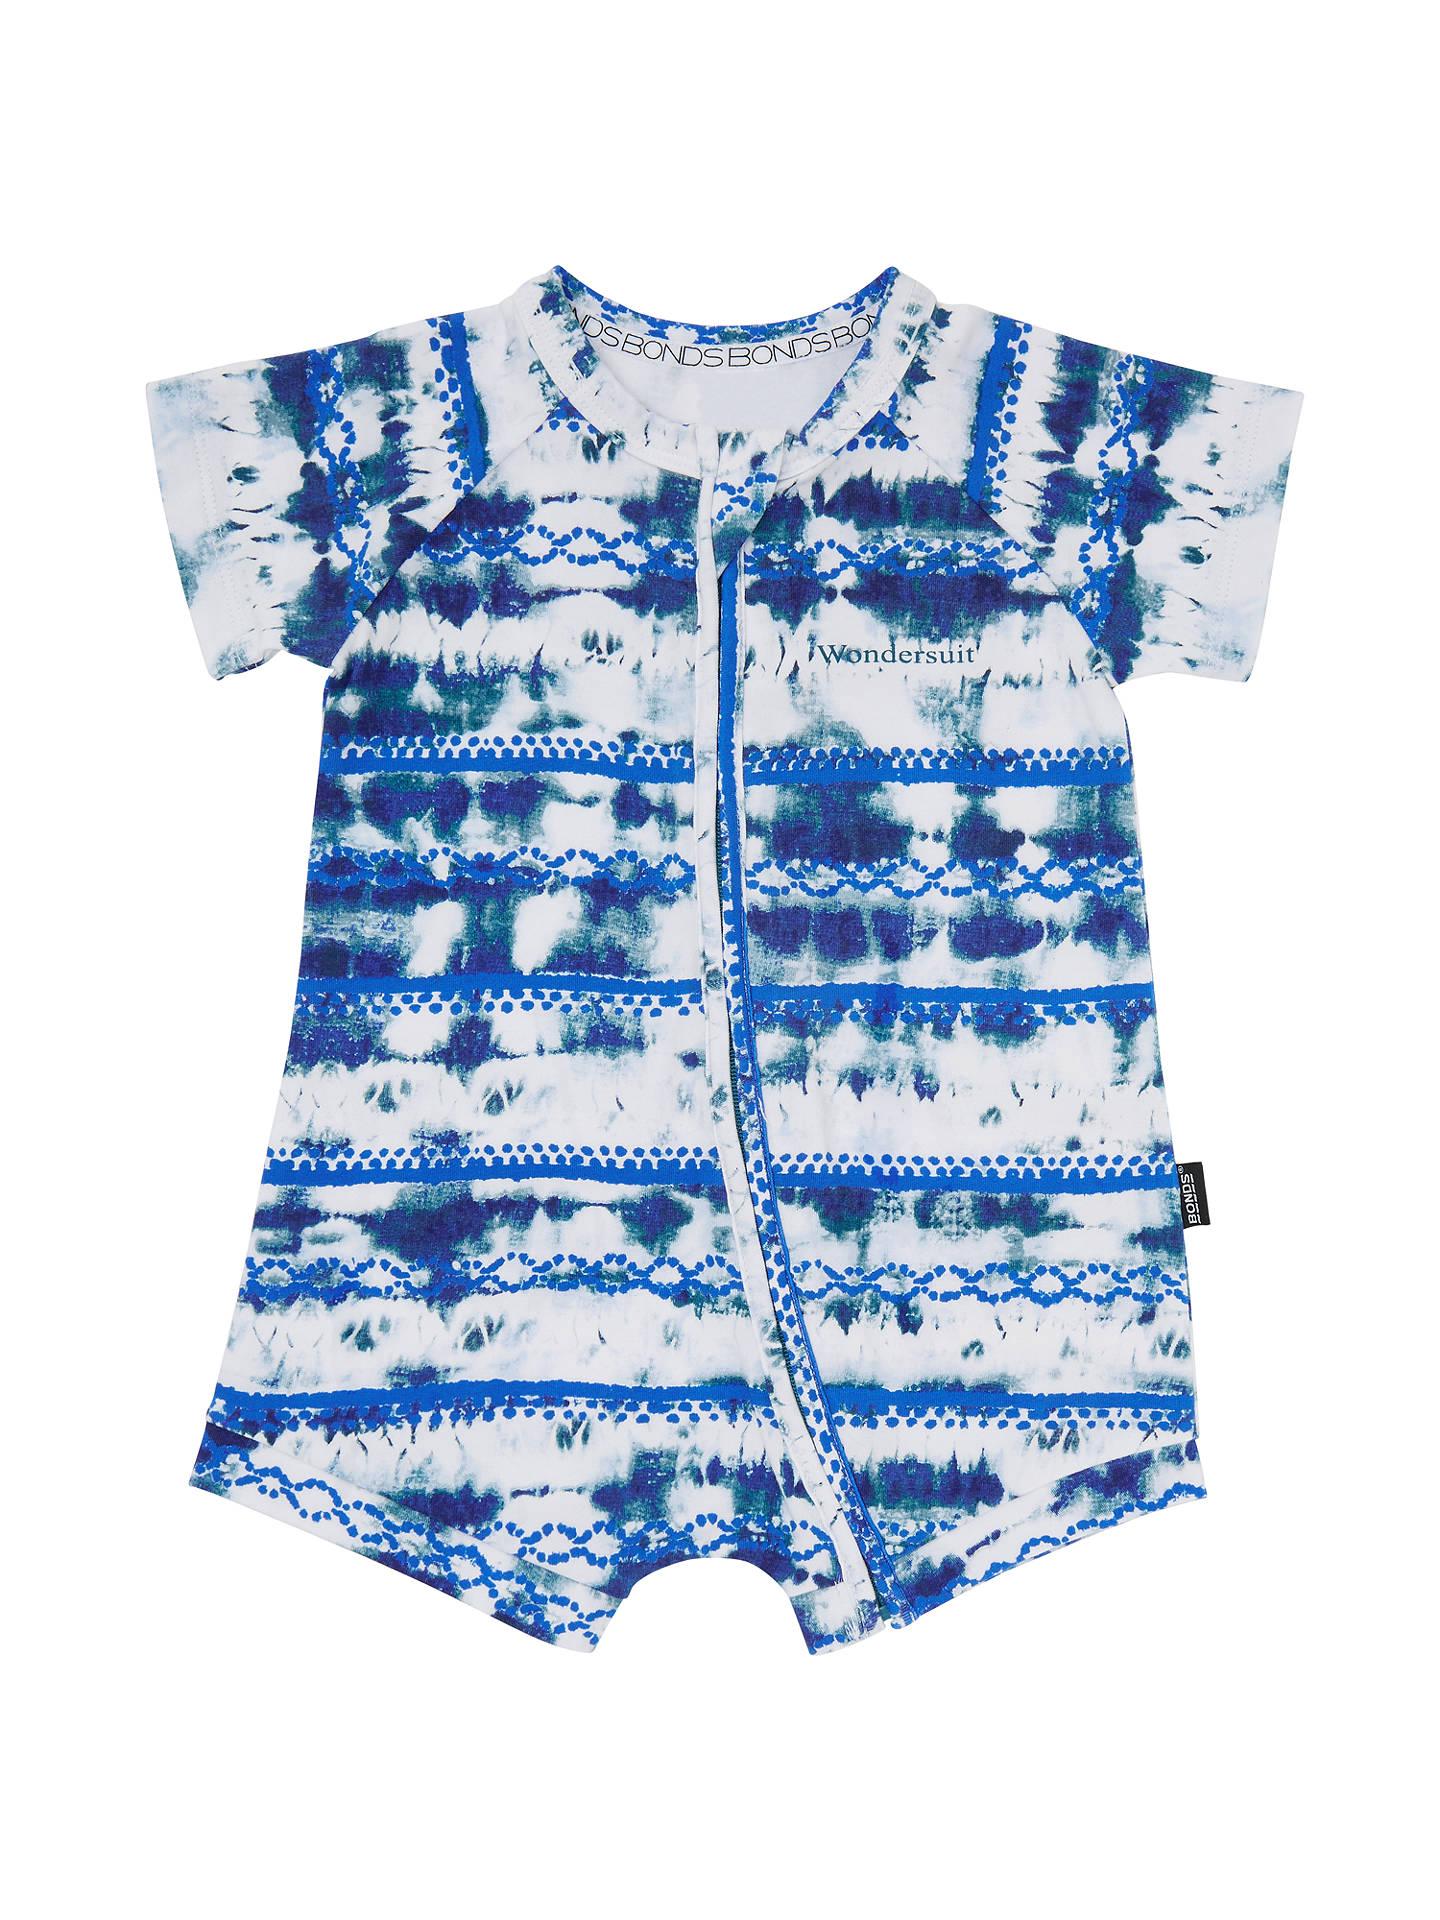 4a9719ccdc Bonds Baby Zip Wondersuit Sandy Romper, Blue/White at John Lewis ...